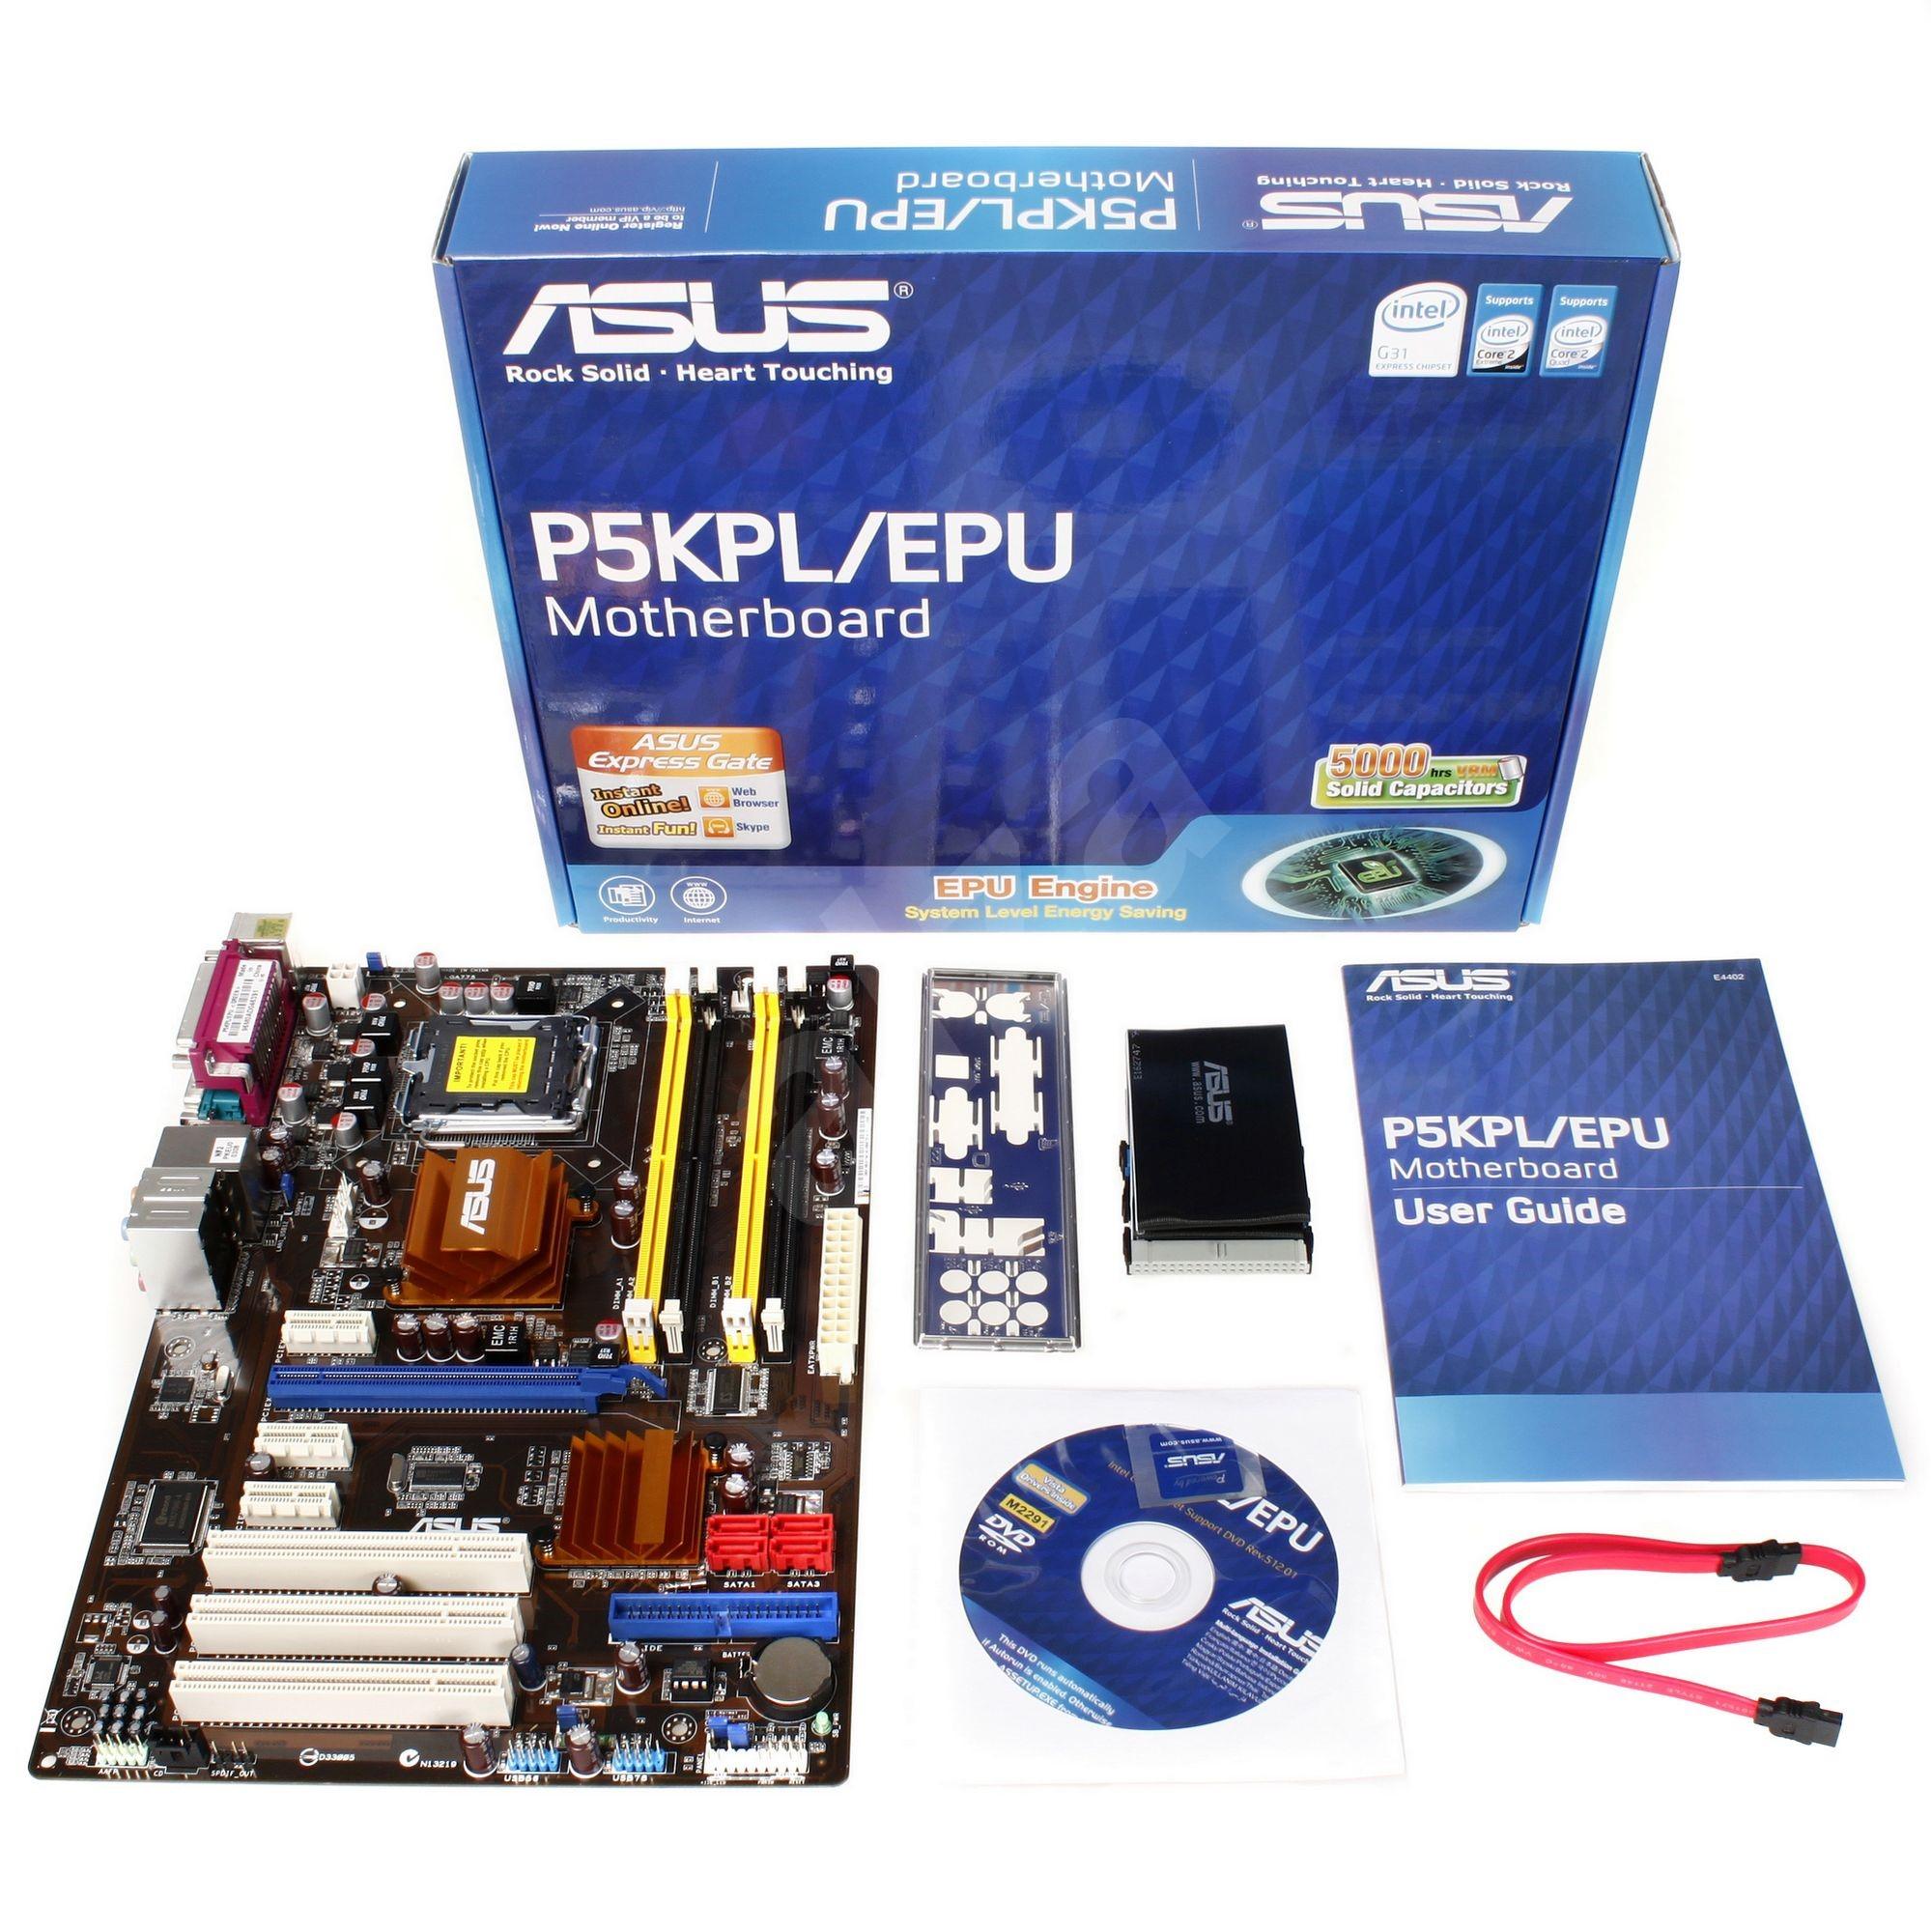 Asus P5kpl Am Ps Drivers Windows 7 Karmashares Llc Leveraging G31 Se Desktop Technology Ultimate Power Saveing Please Visit More Supported Models Specifications